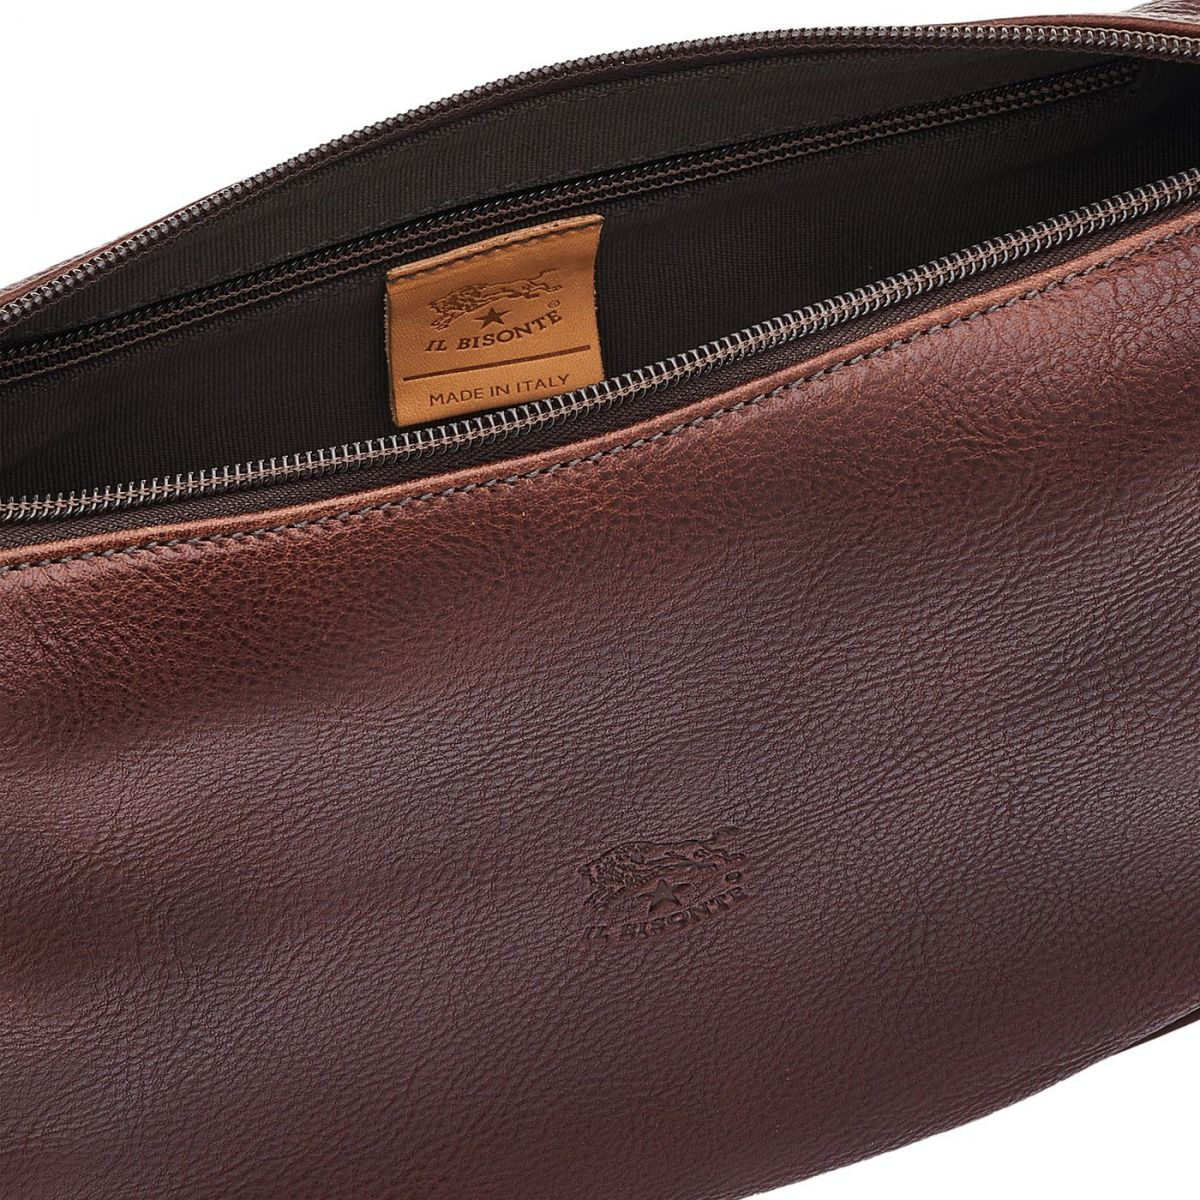 Women's Crossbody Bag in Vintage Cowhide Leather BCR021 color Dark Brown | Details